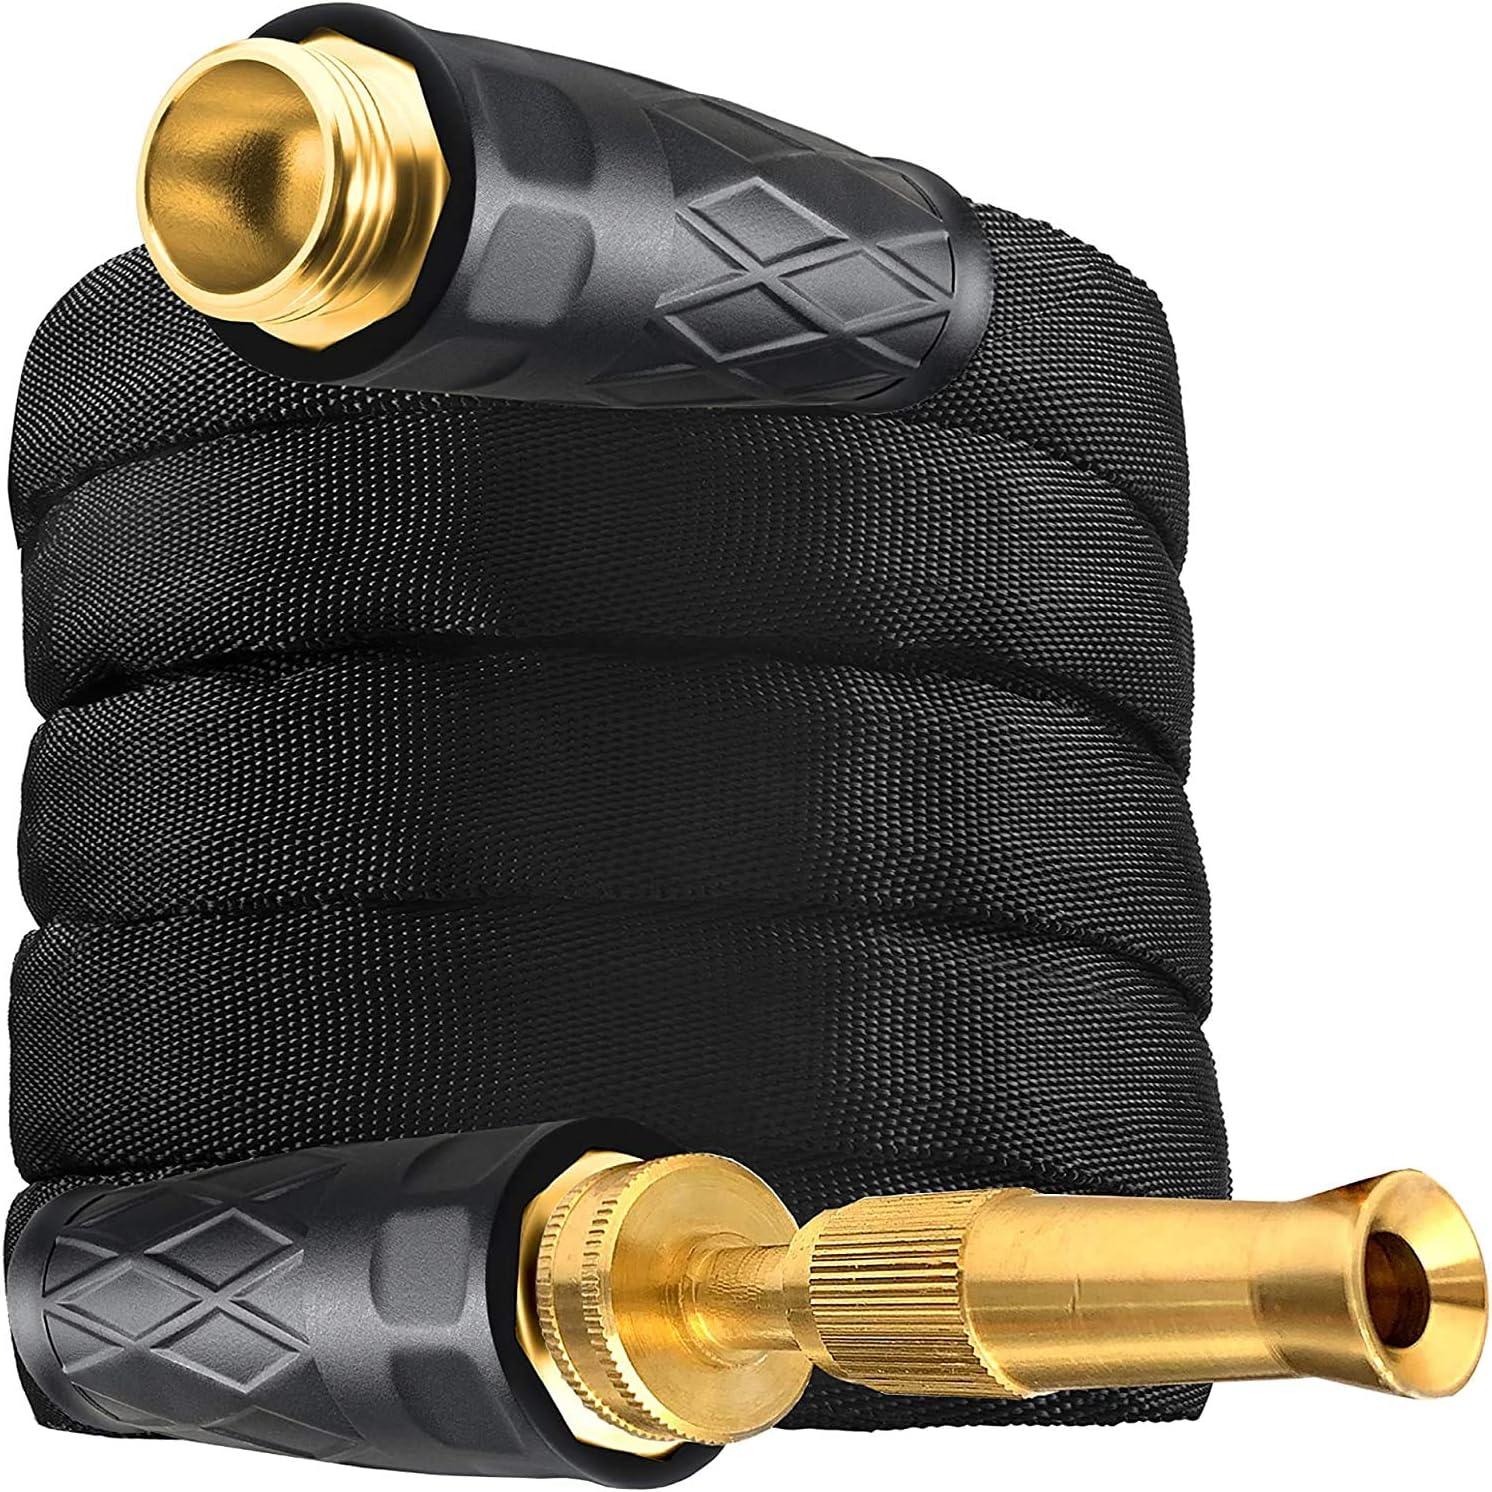 BIONIC FLEX 7647 Pro Garden Hose 100', Black